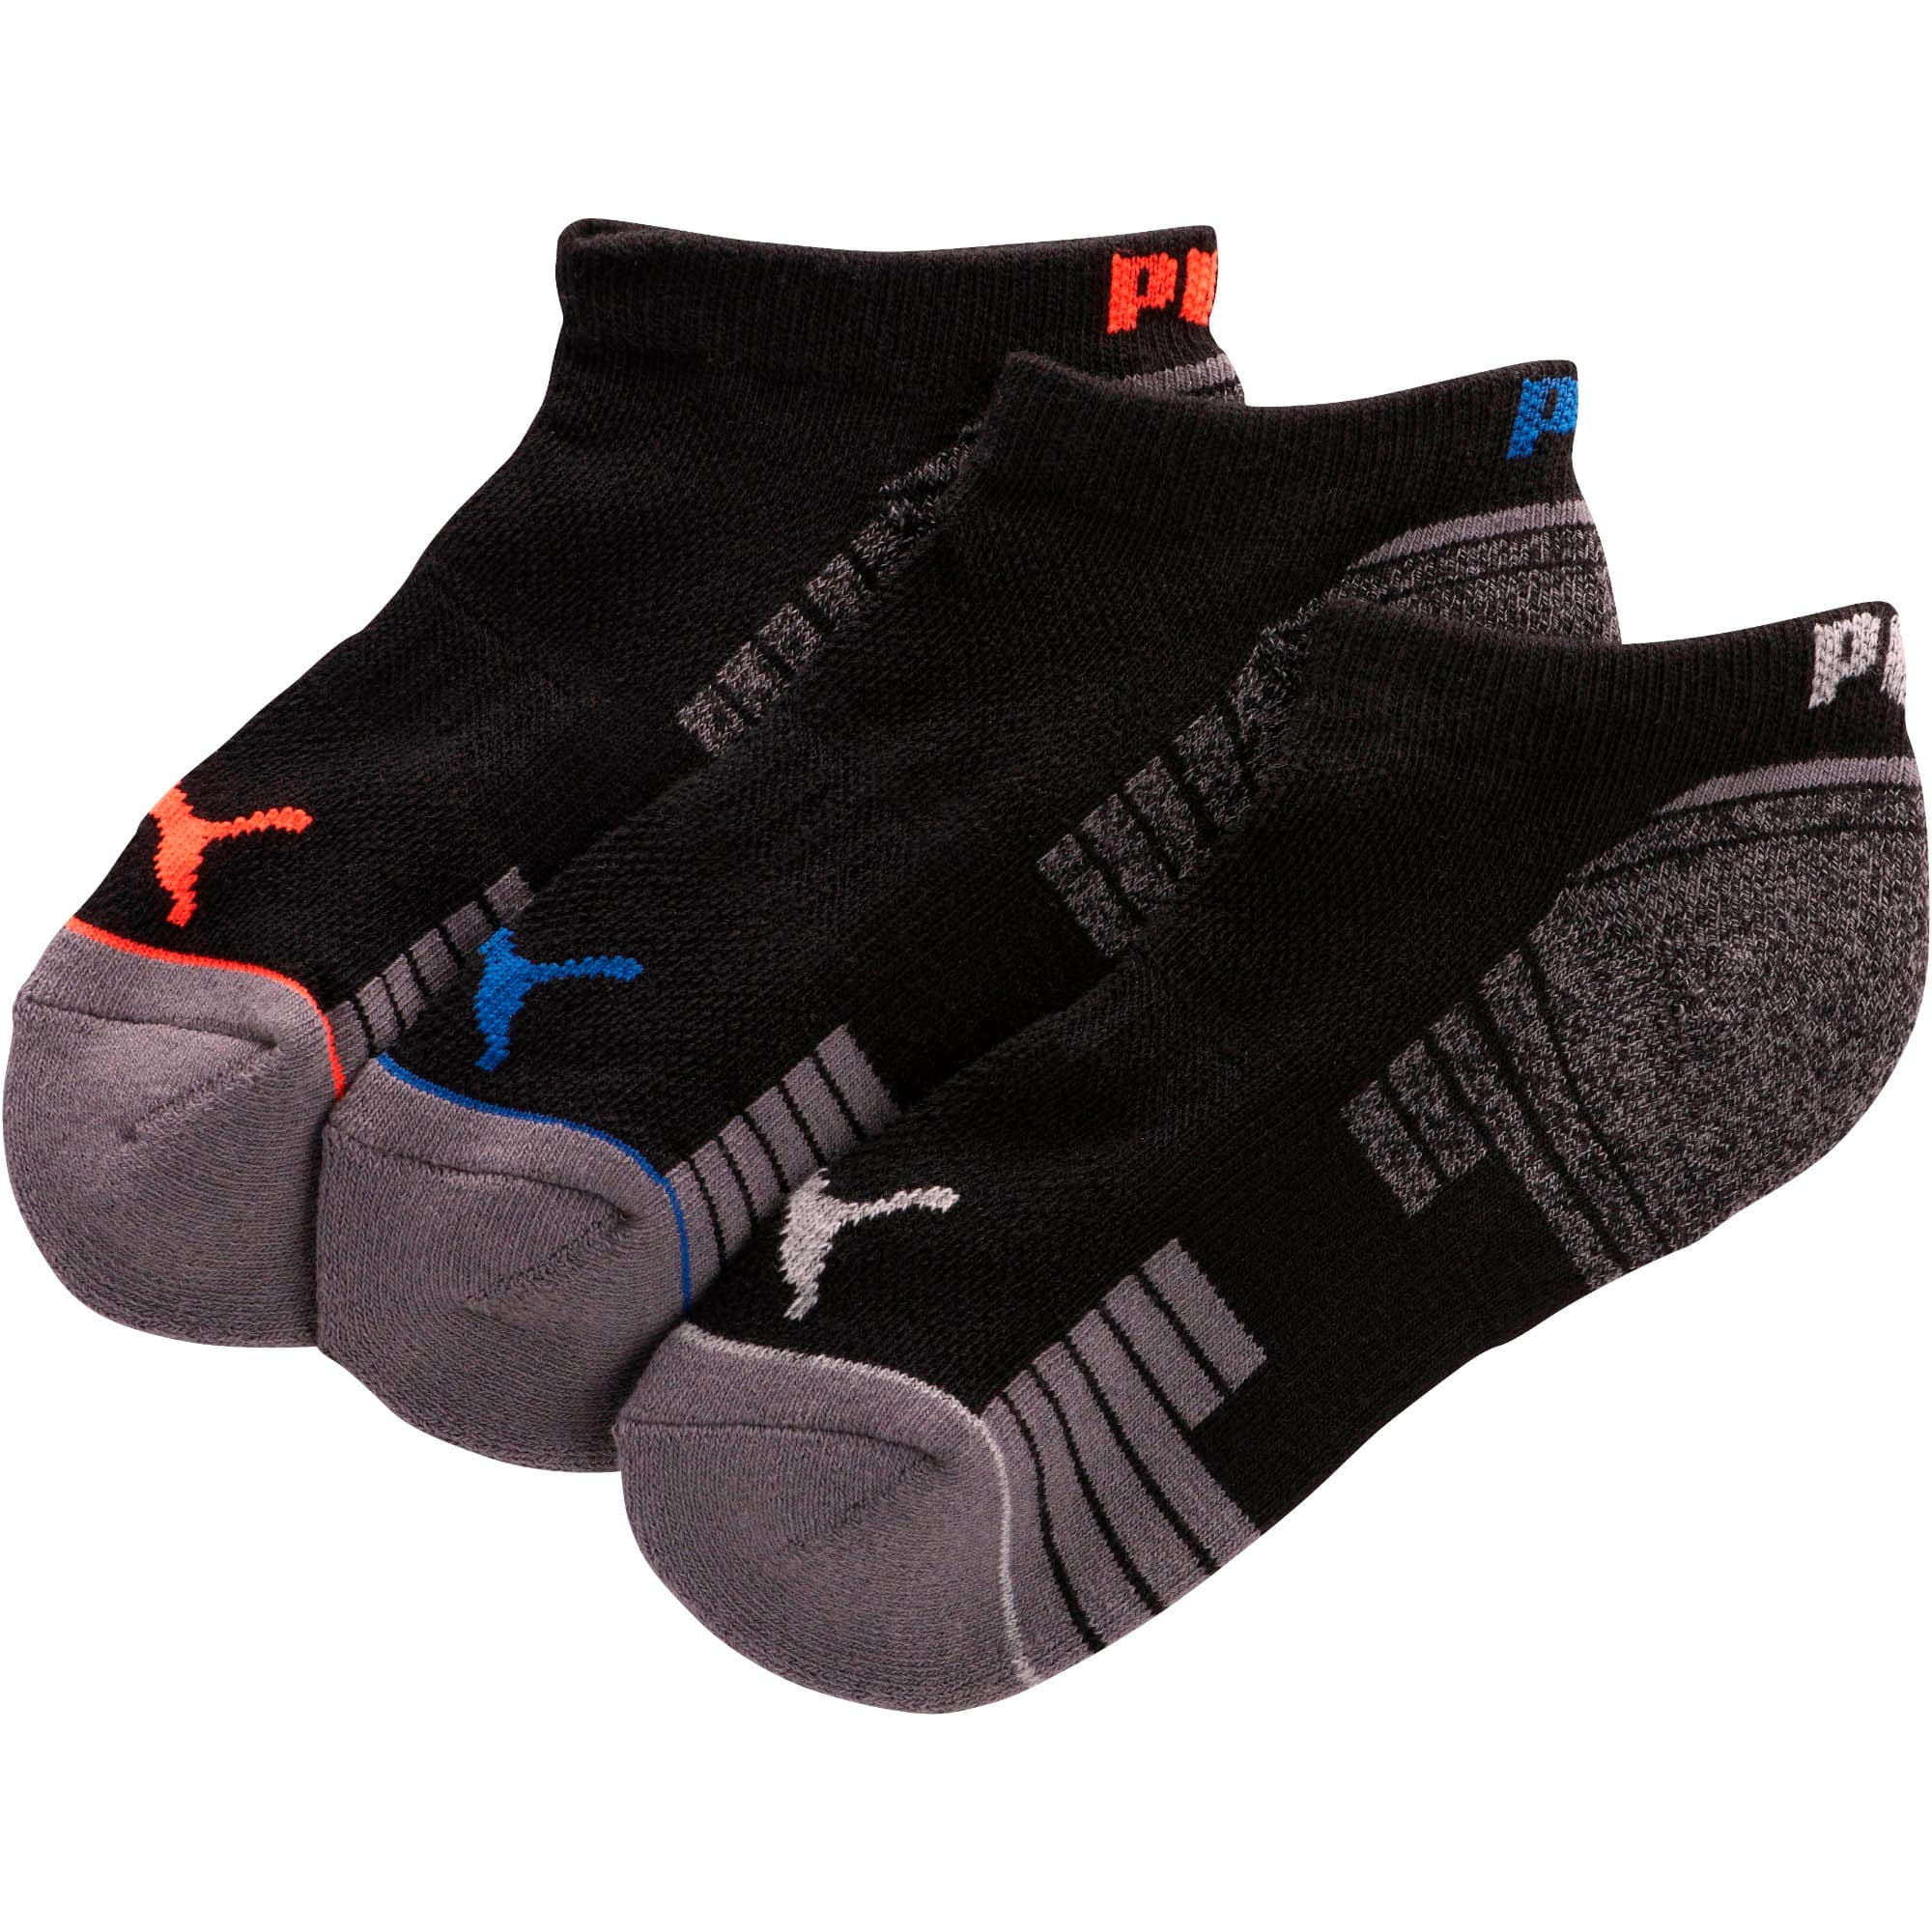 Thumbnail 1 of Boys' 1/2 Terry Low Cut Socks [3 Pack], BLACK / BLUE, medium